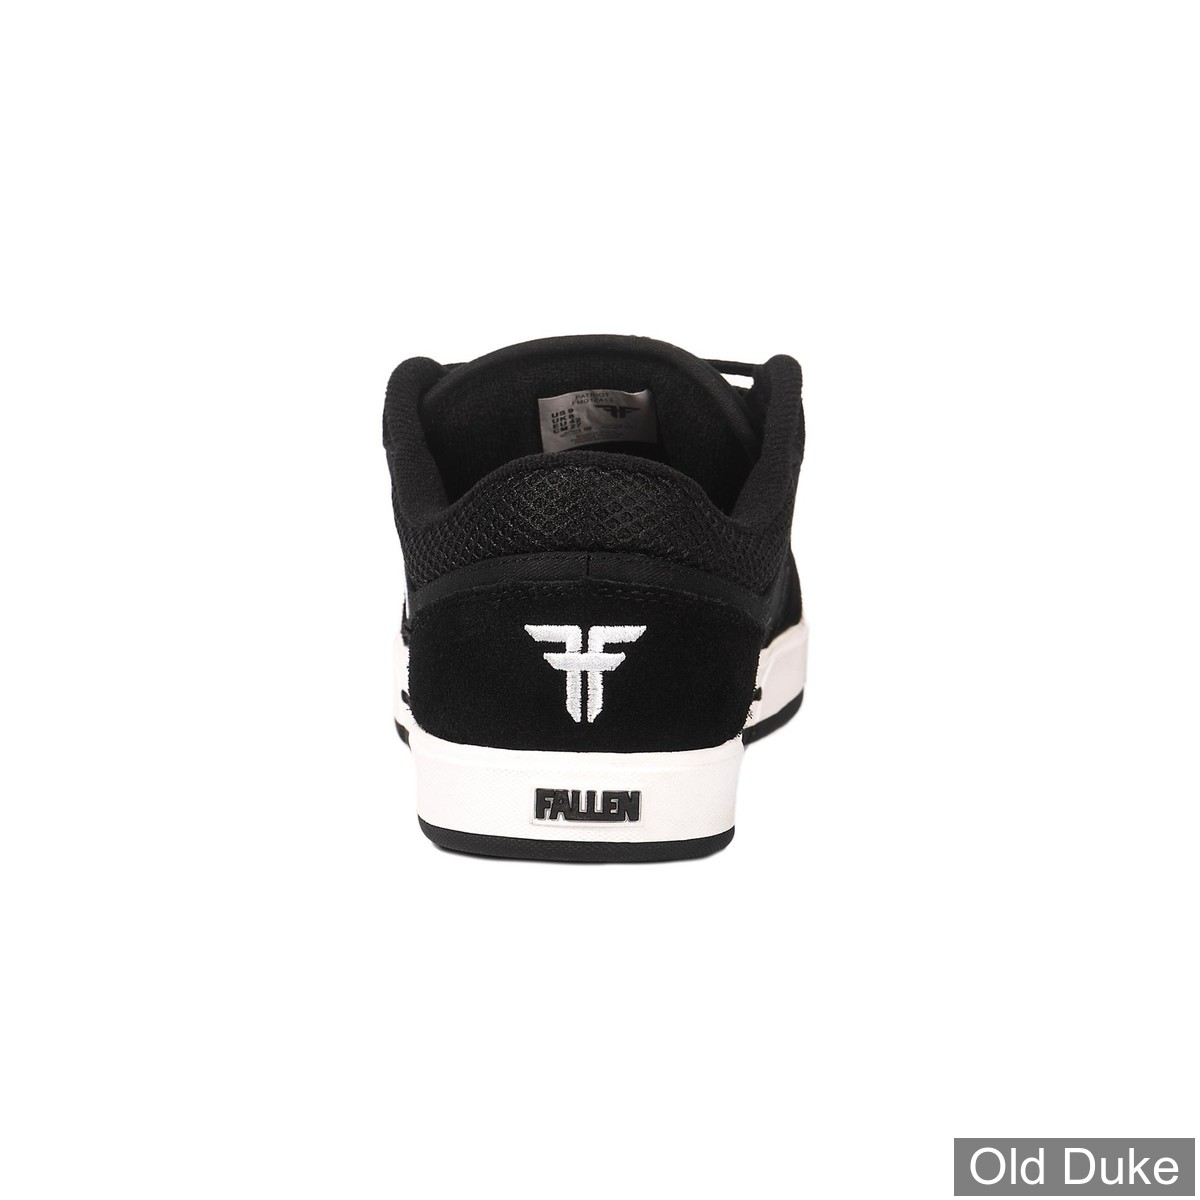 SKATE SHOES - FALLEN - PATRIOT - BLACK WHITE